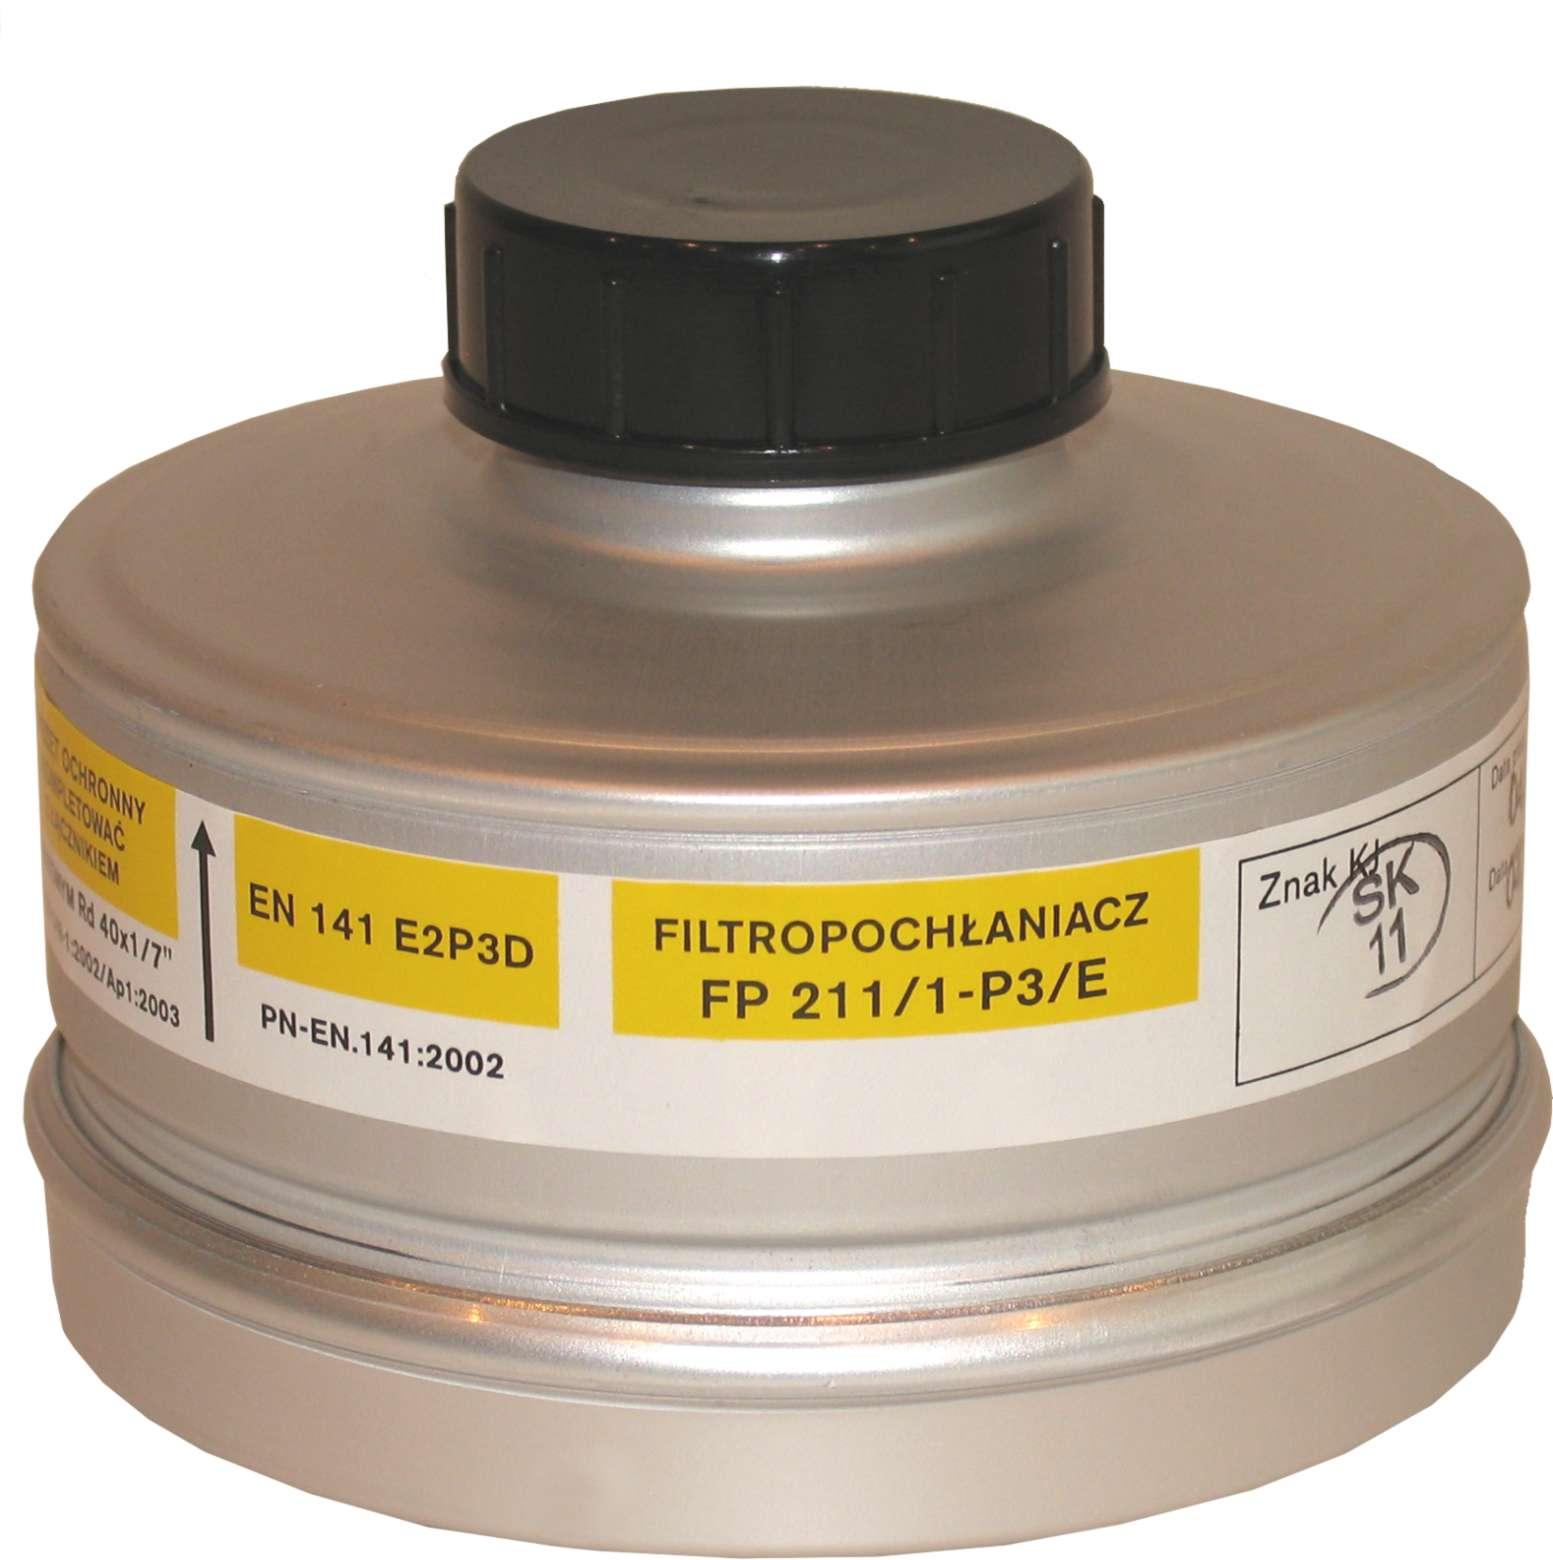 Filtropochłaniacz FP 211/1-P3/E